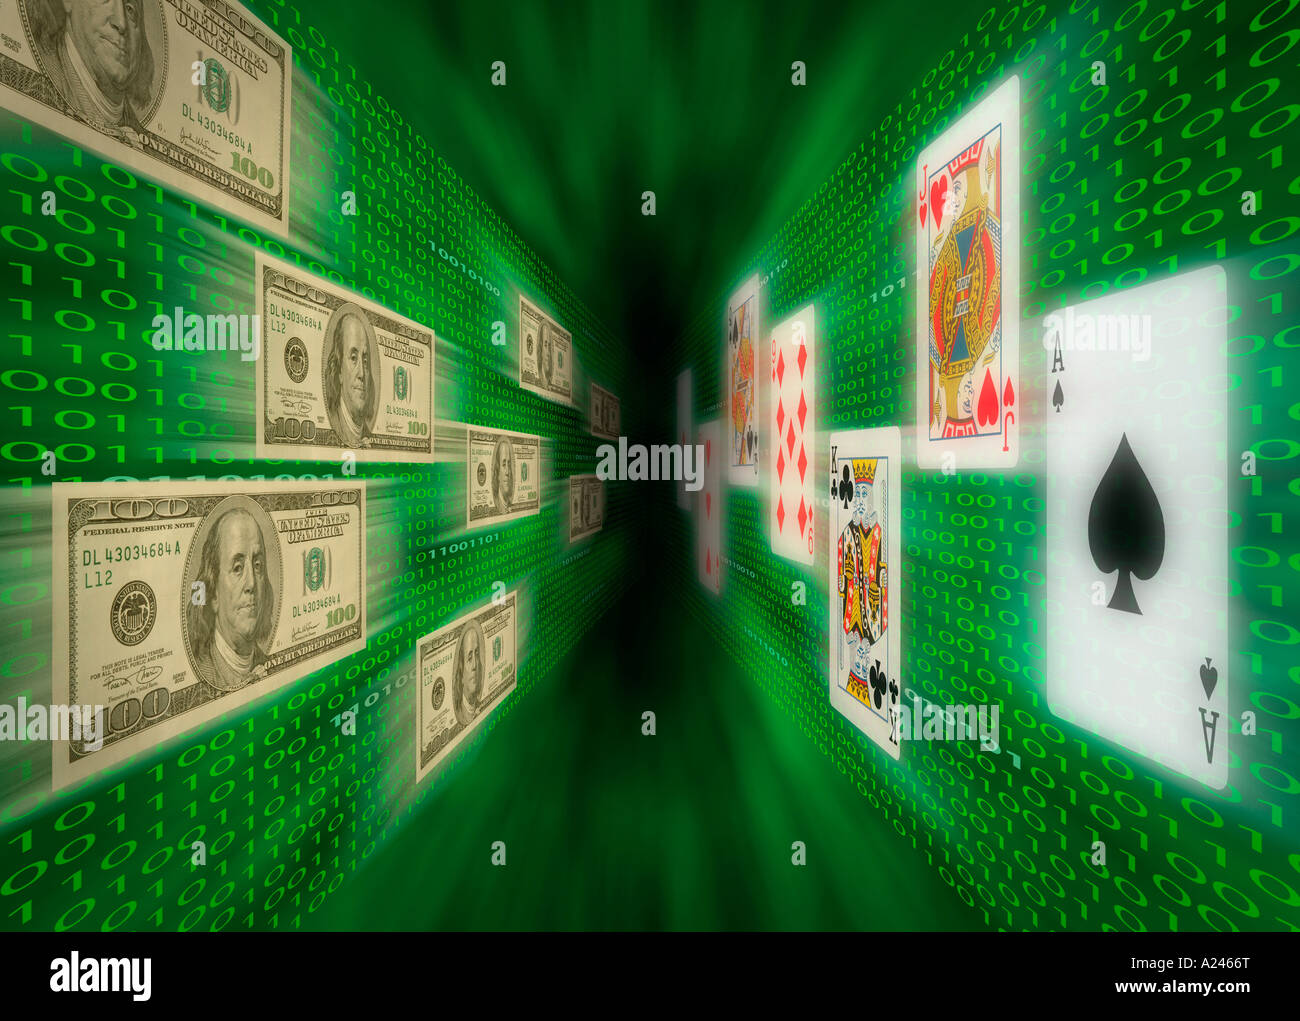 Playing cards and $100 bills flying along walls of binary code possibly representing Internet gambling - Stock Image